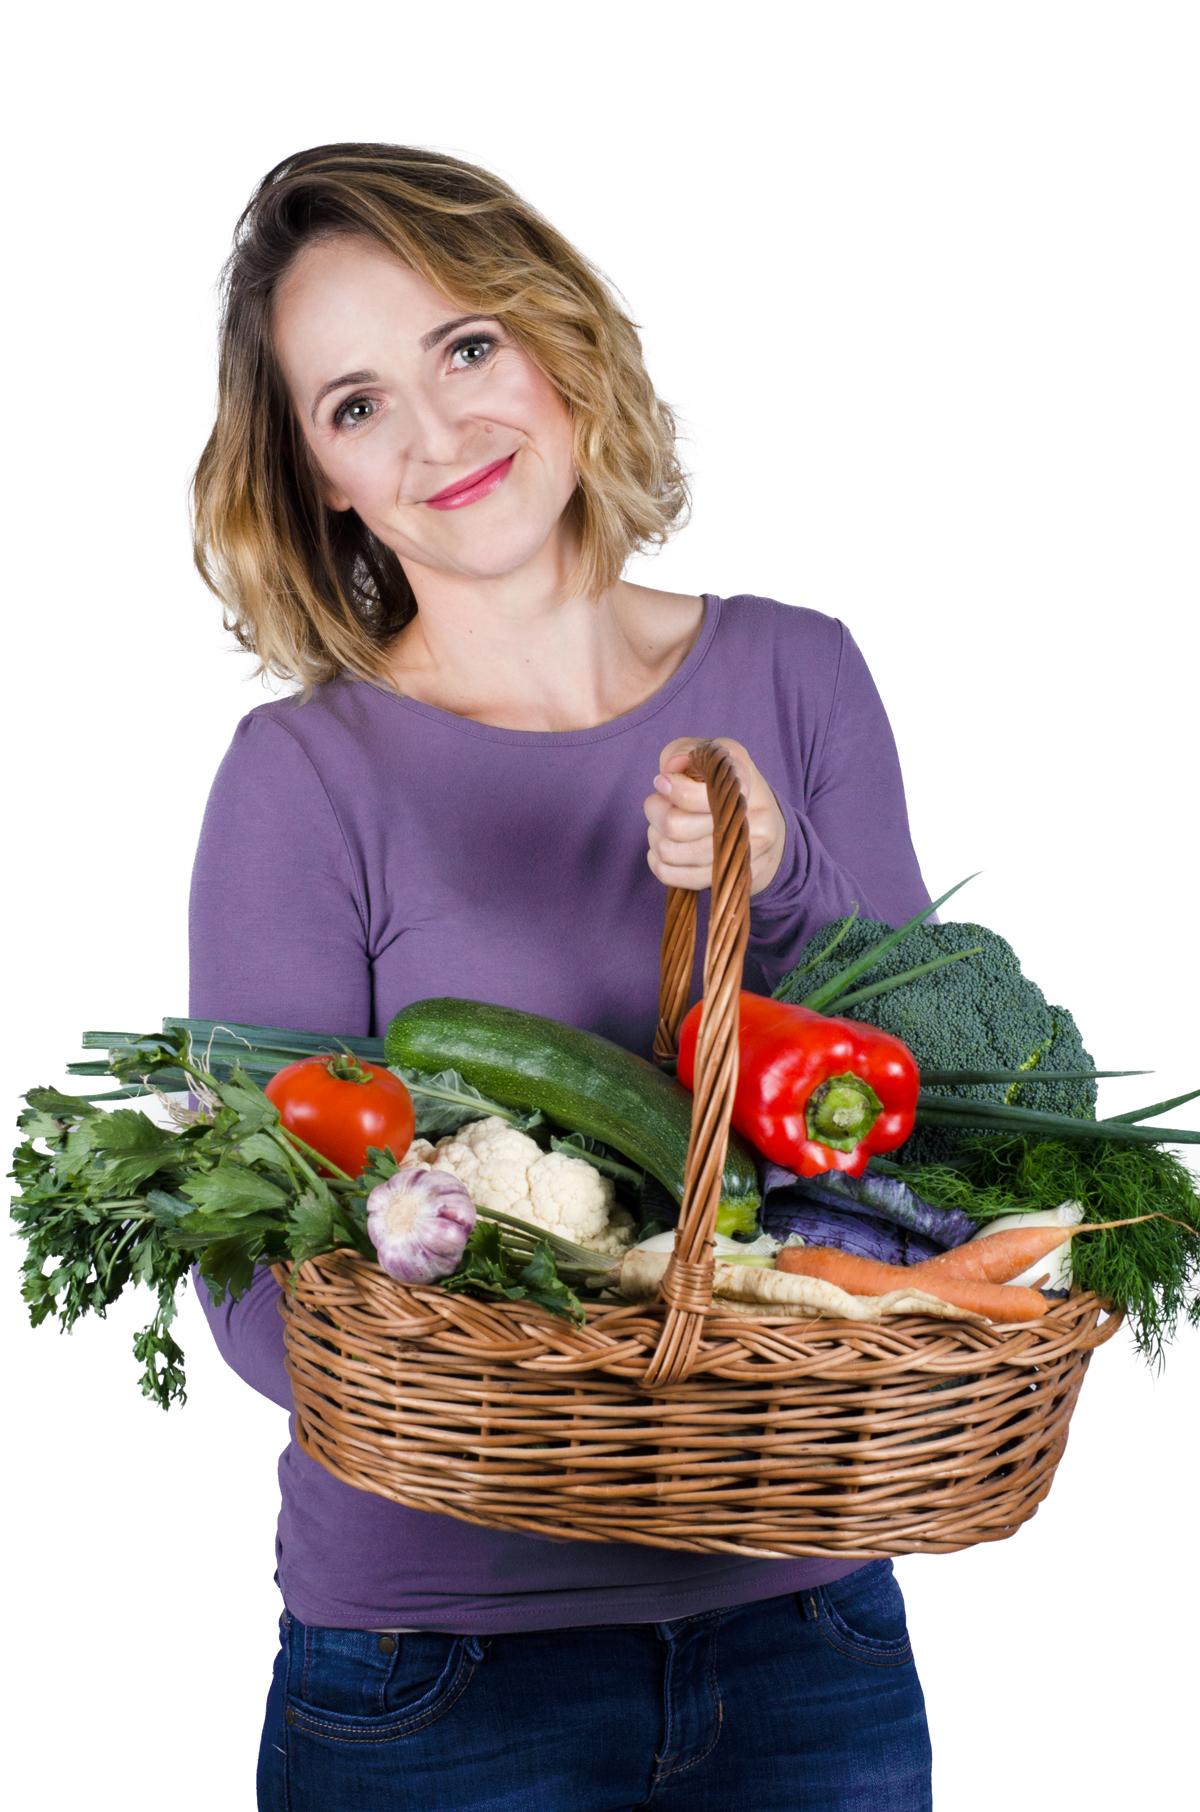 Co jeść, żeby schudnąć? - sunela.eu